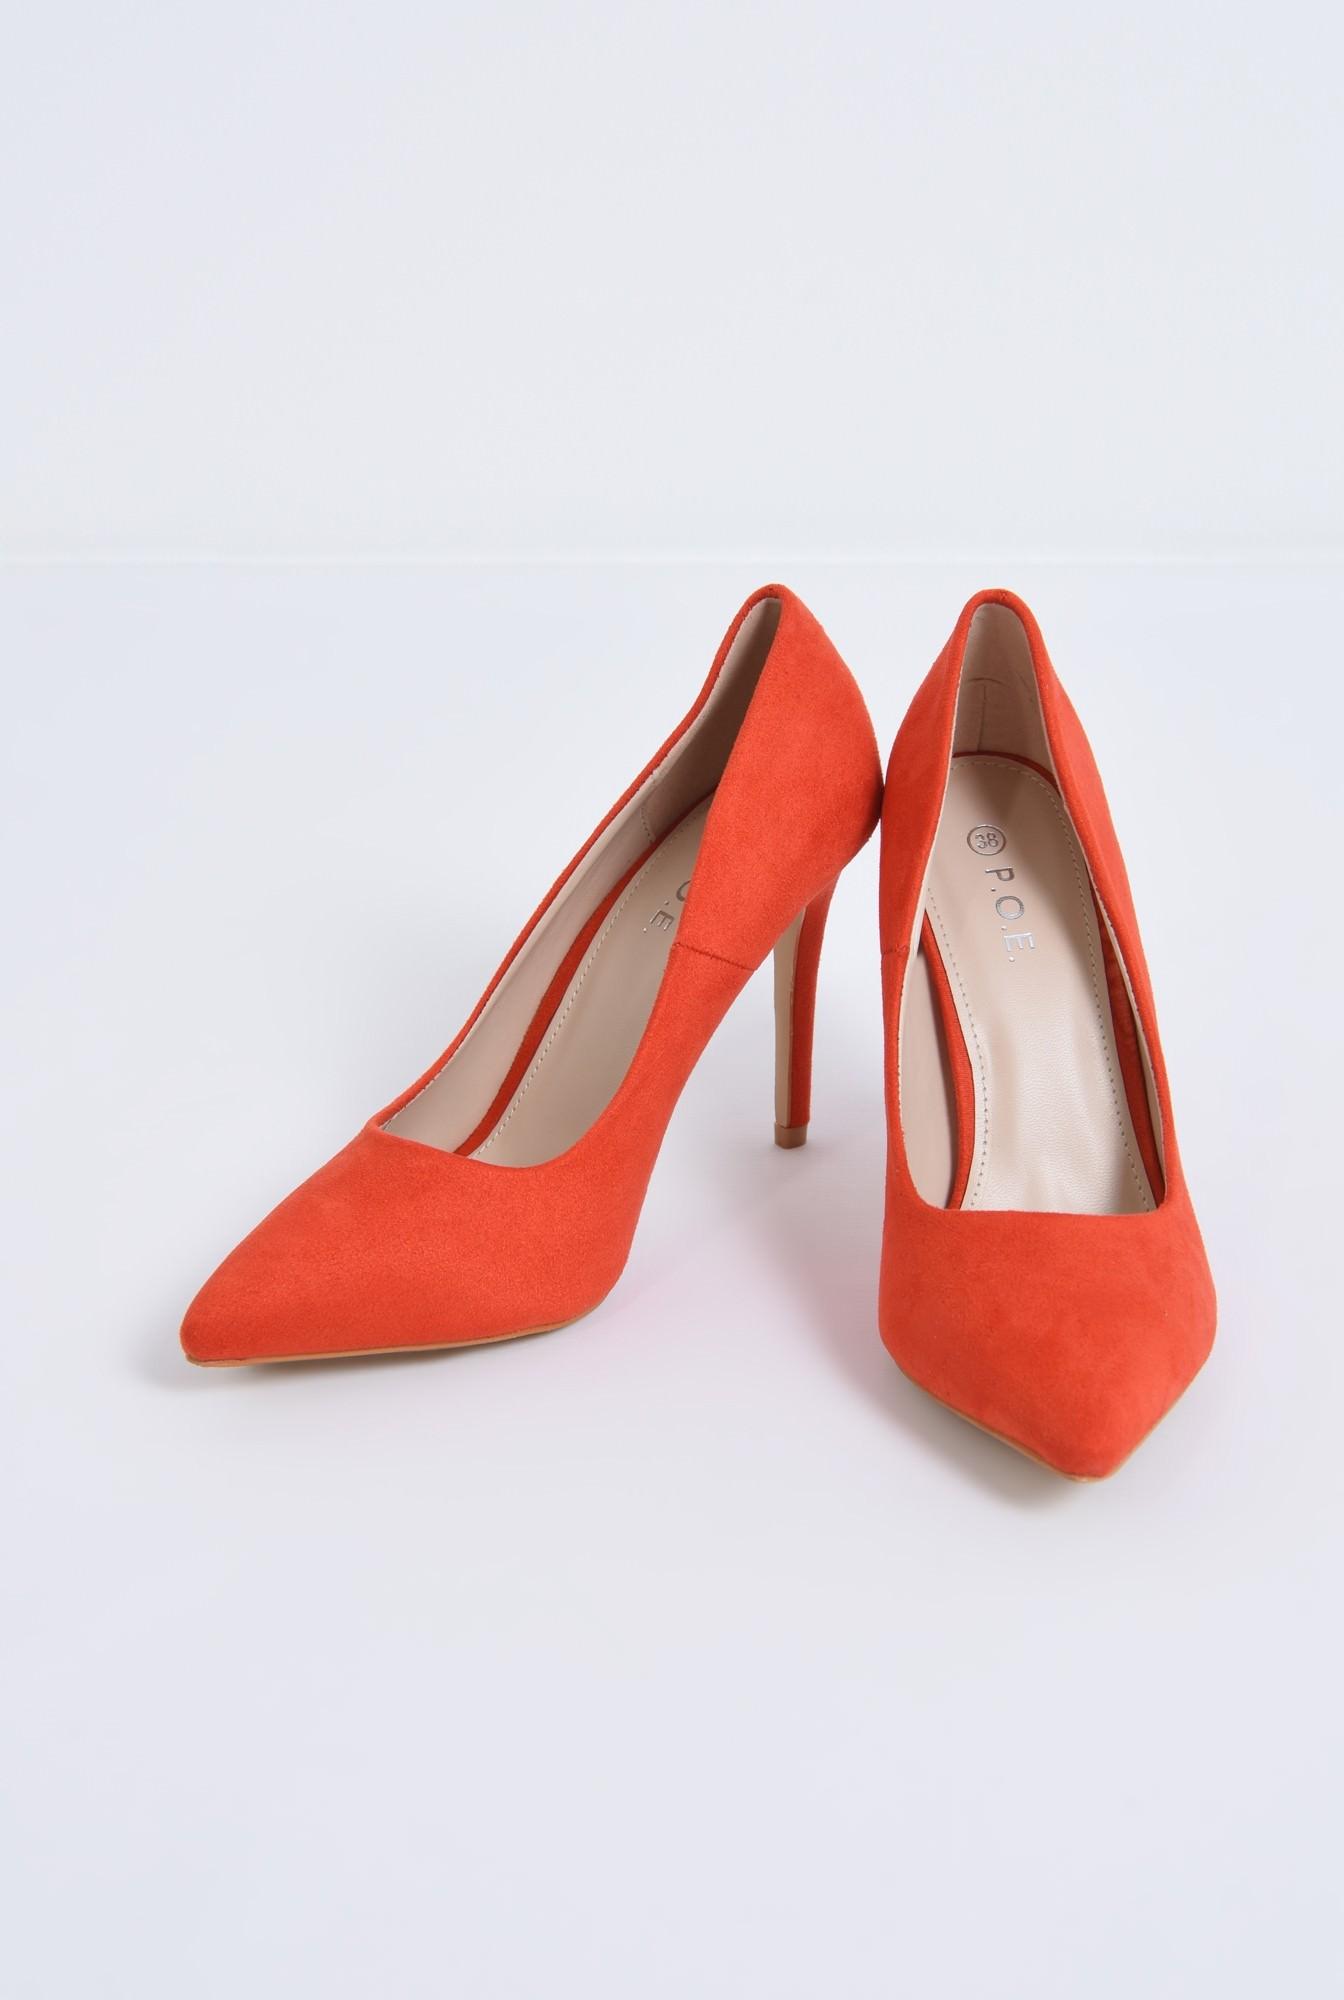 3 - pantofi casual, rosu, stiletto